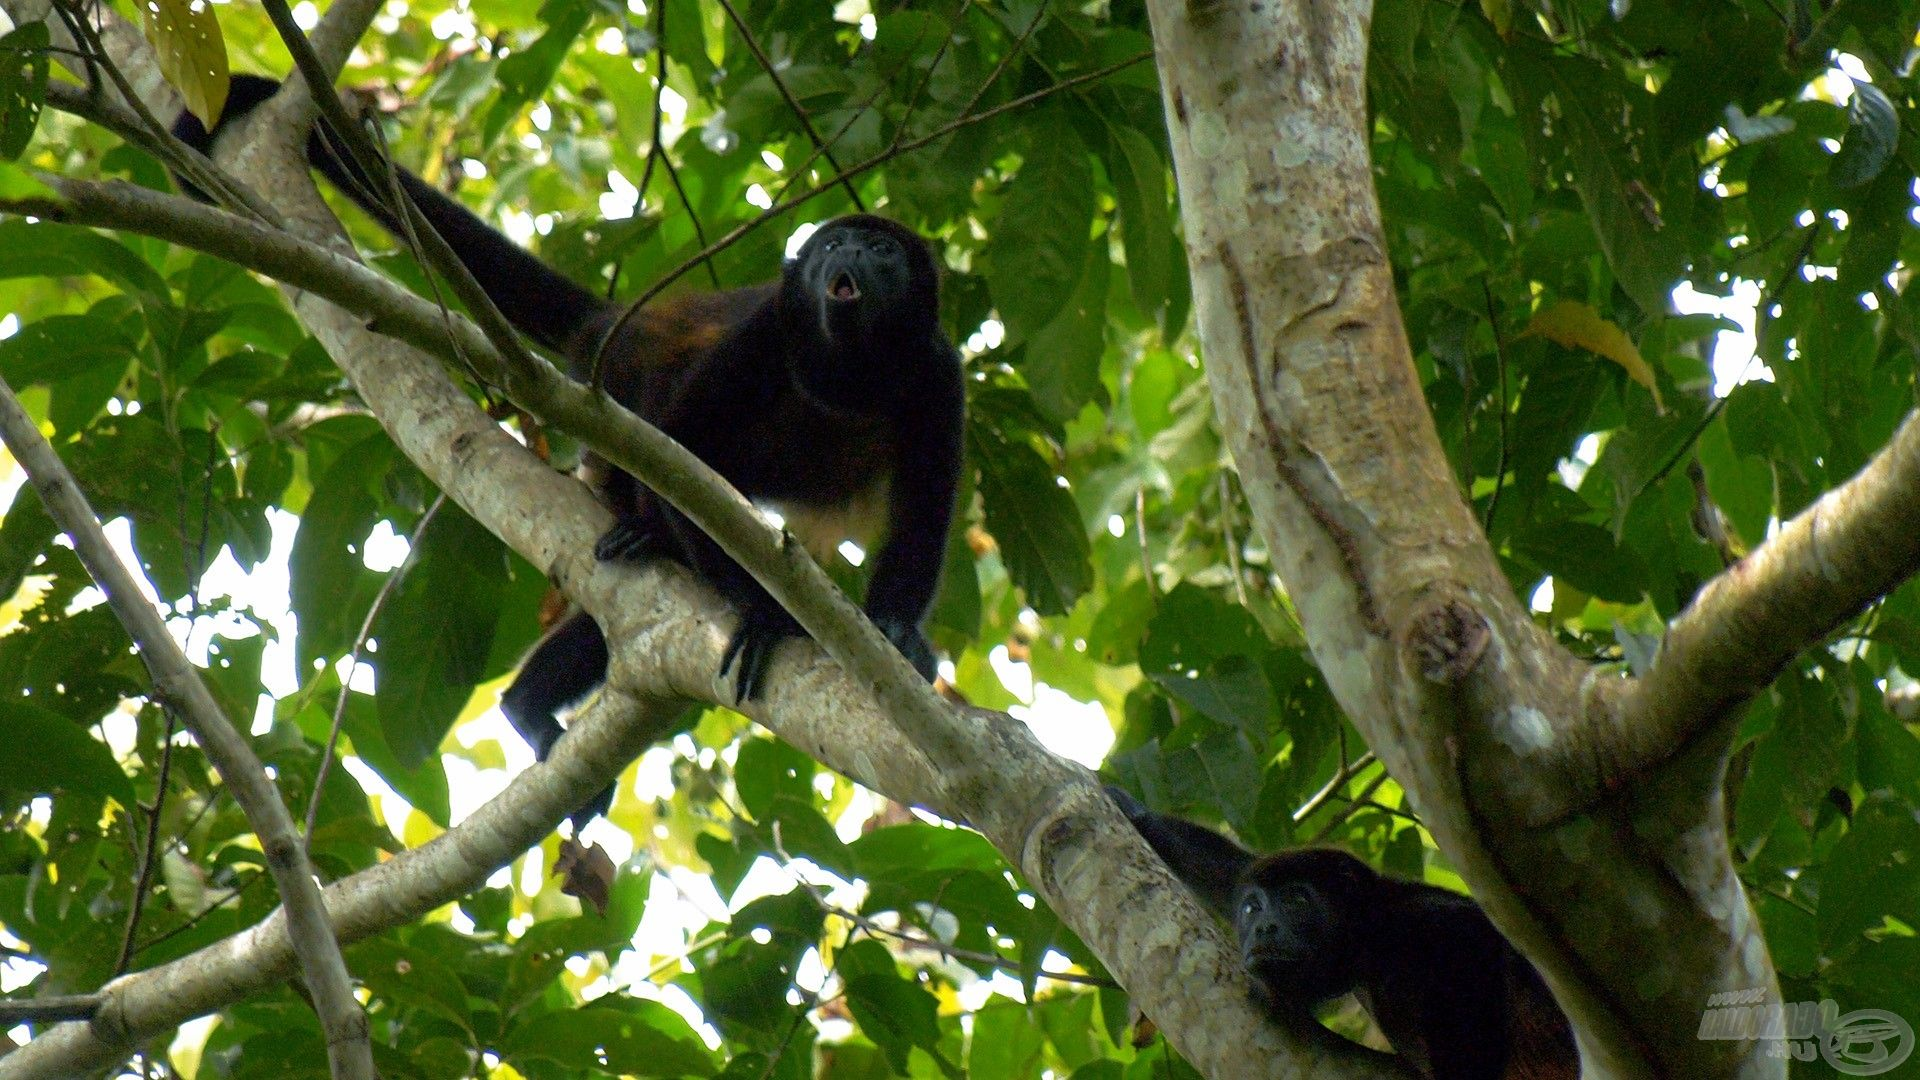 Megdöbbentően gazdag Costa Rica állatvilága